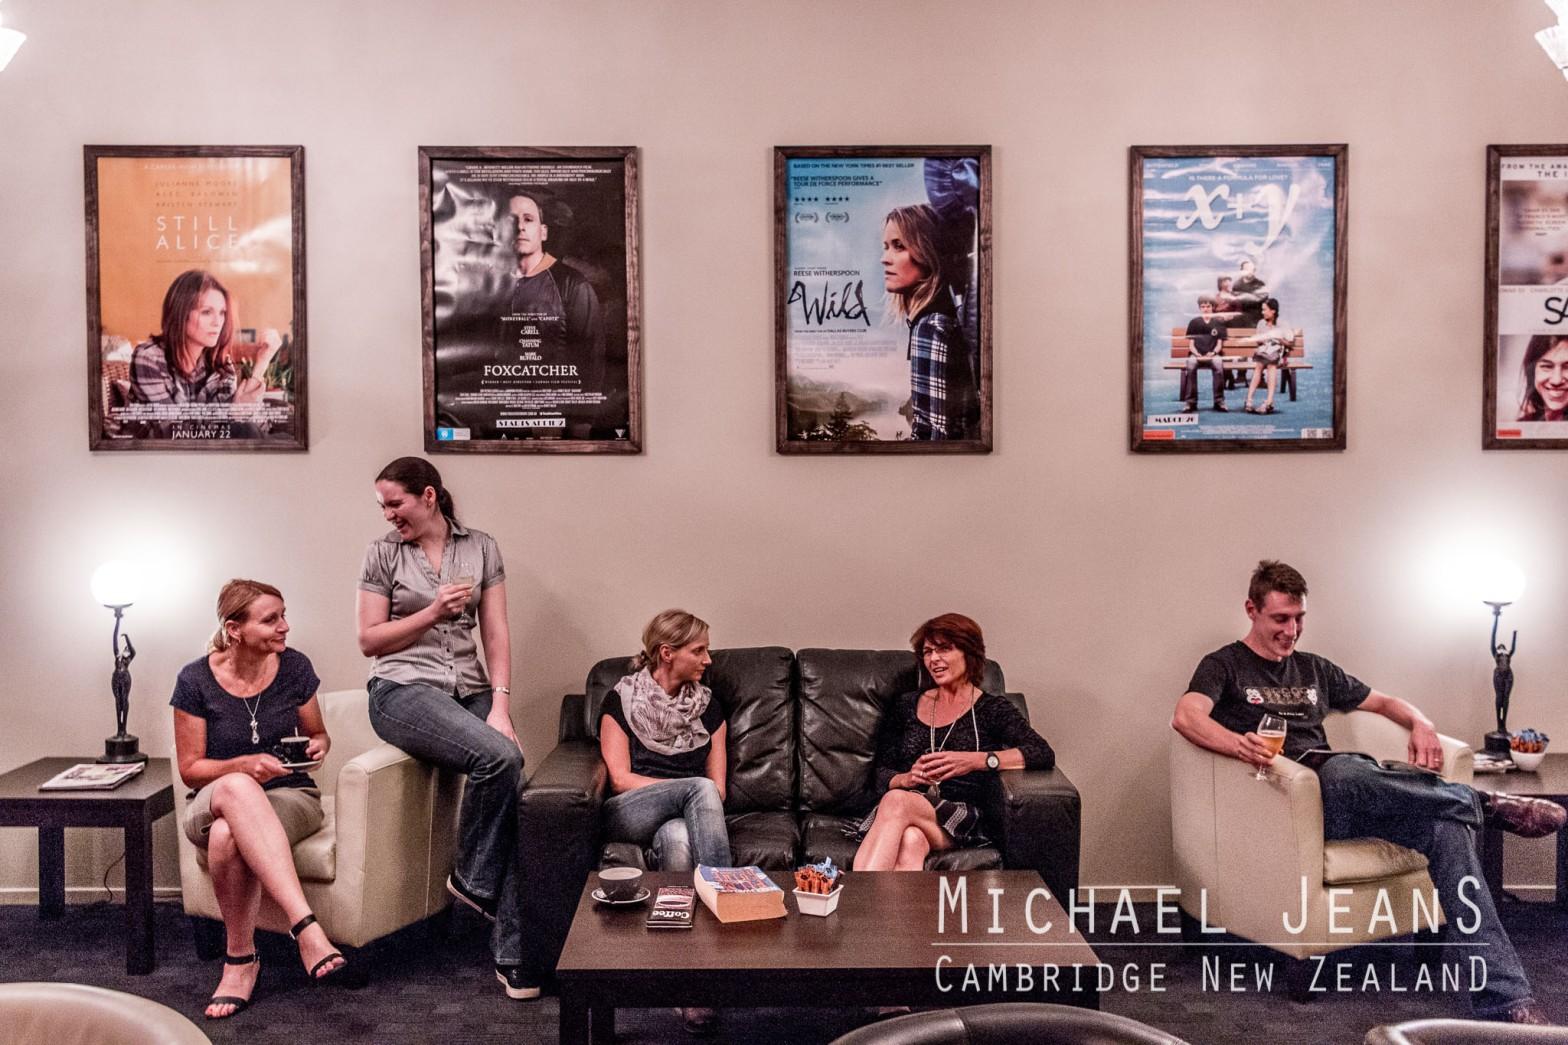 Tivoli Cinema Cambridge New Zealand